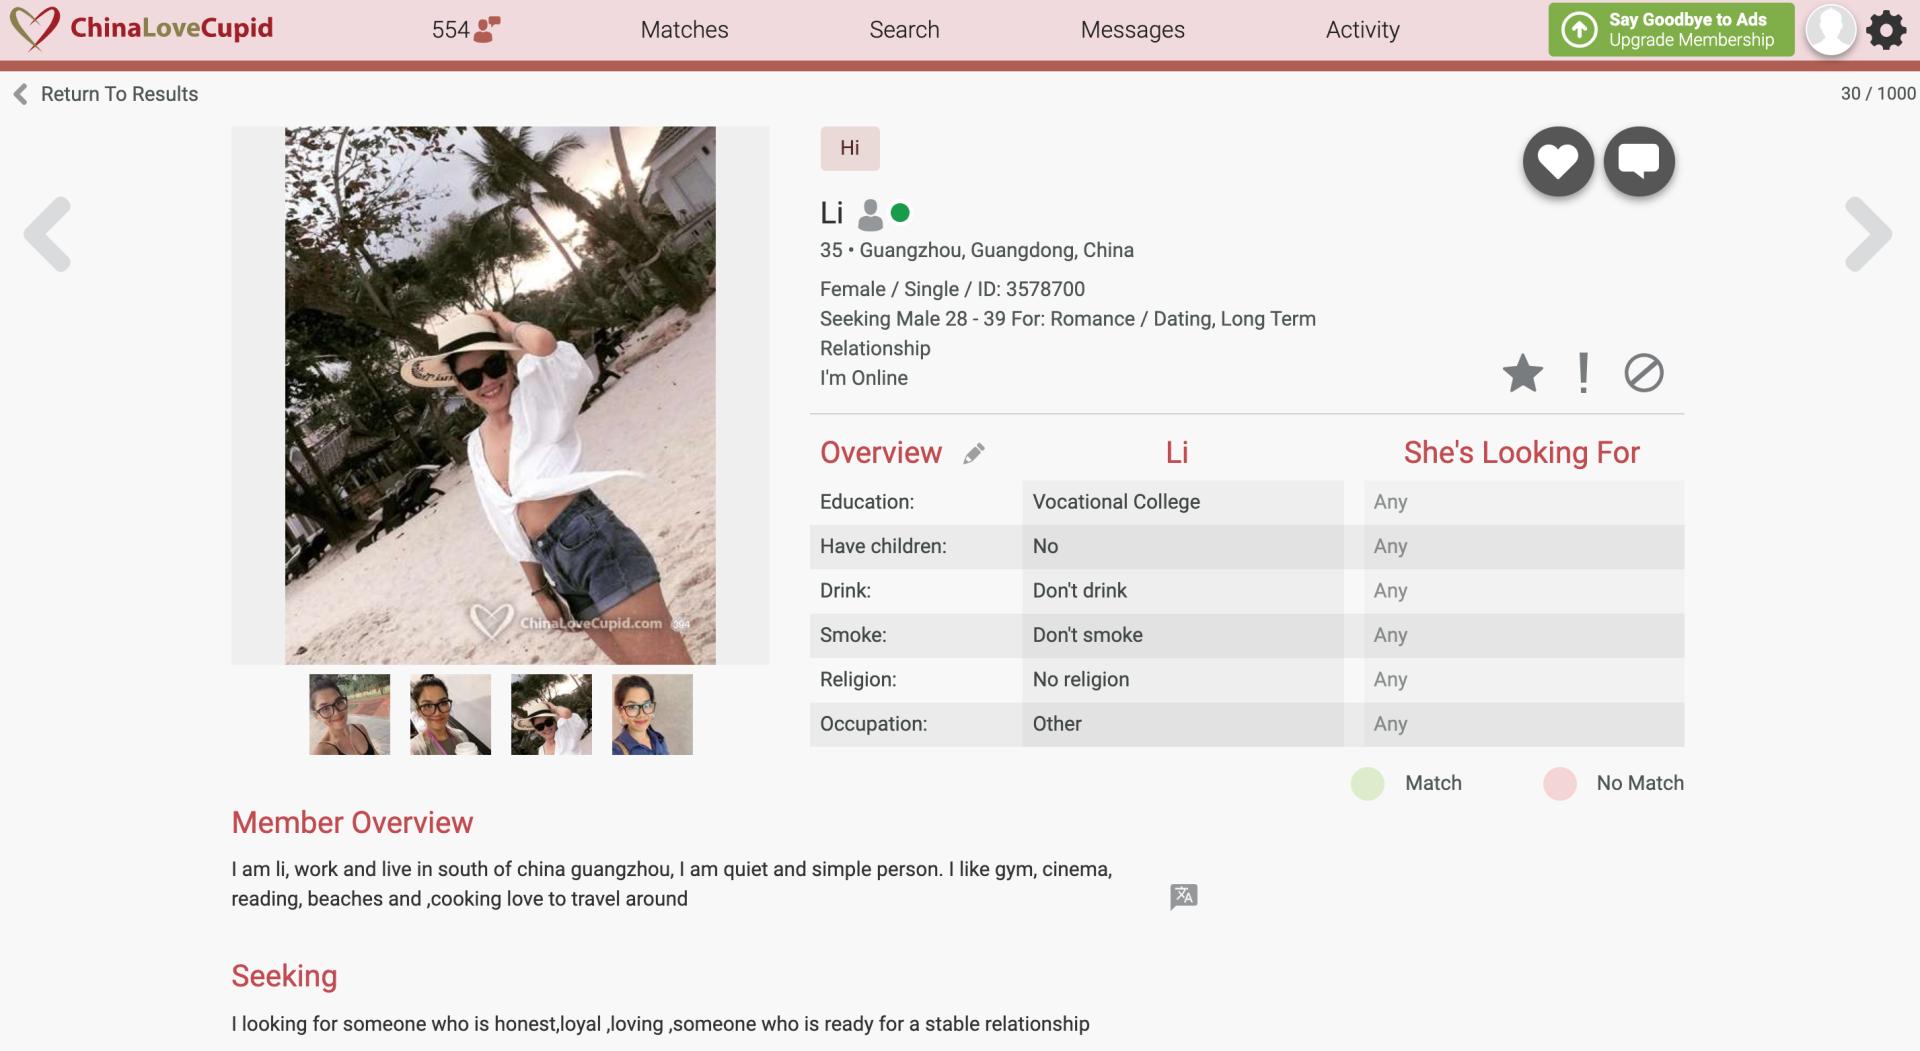 ChinaLoveCupid girl profile